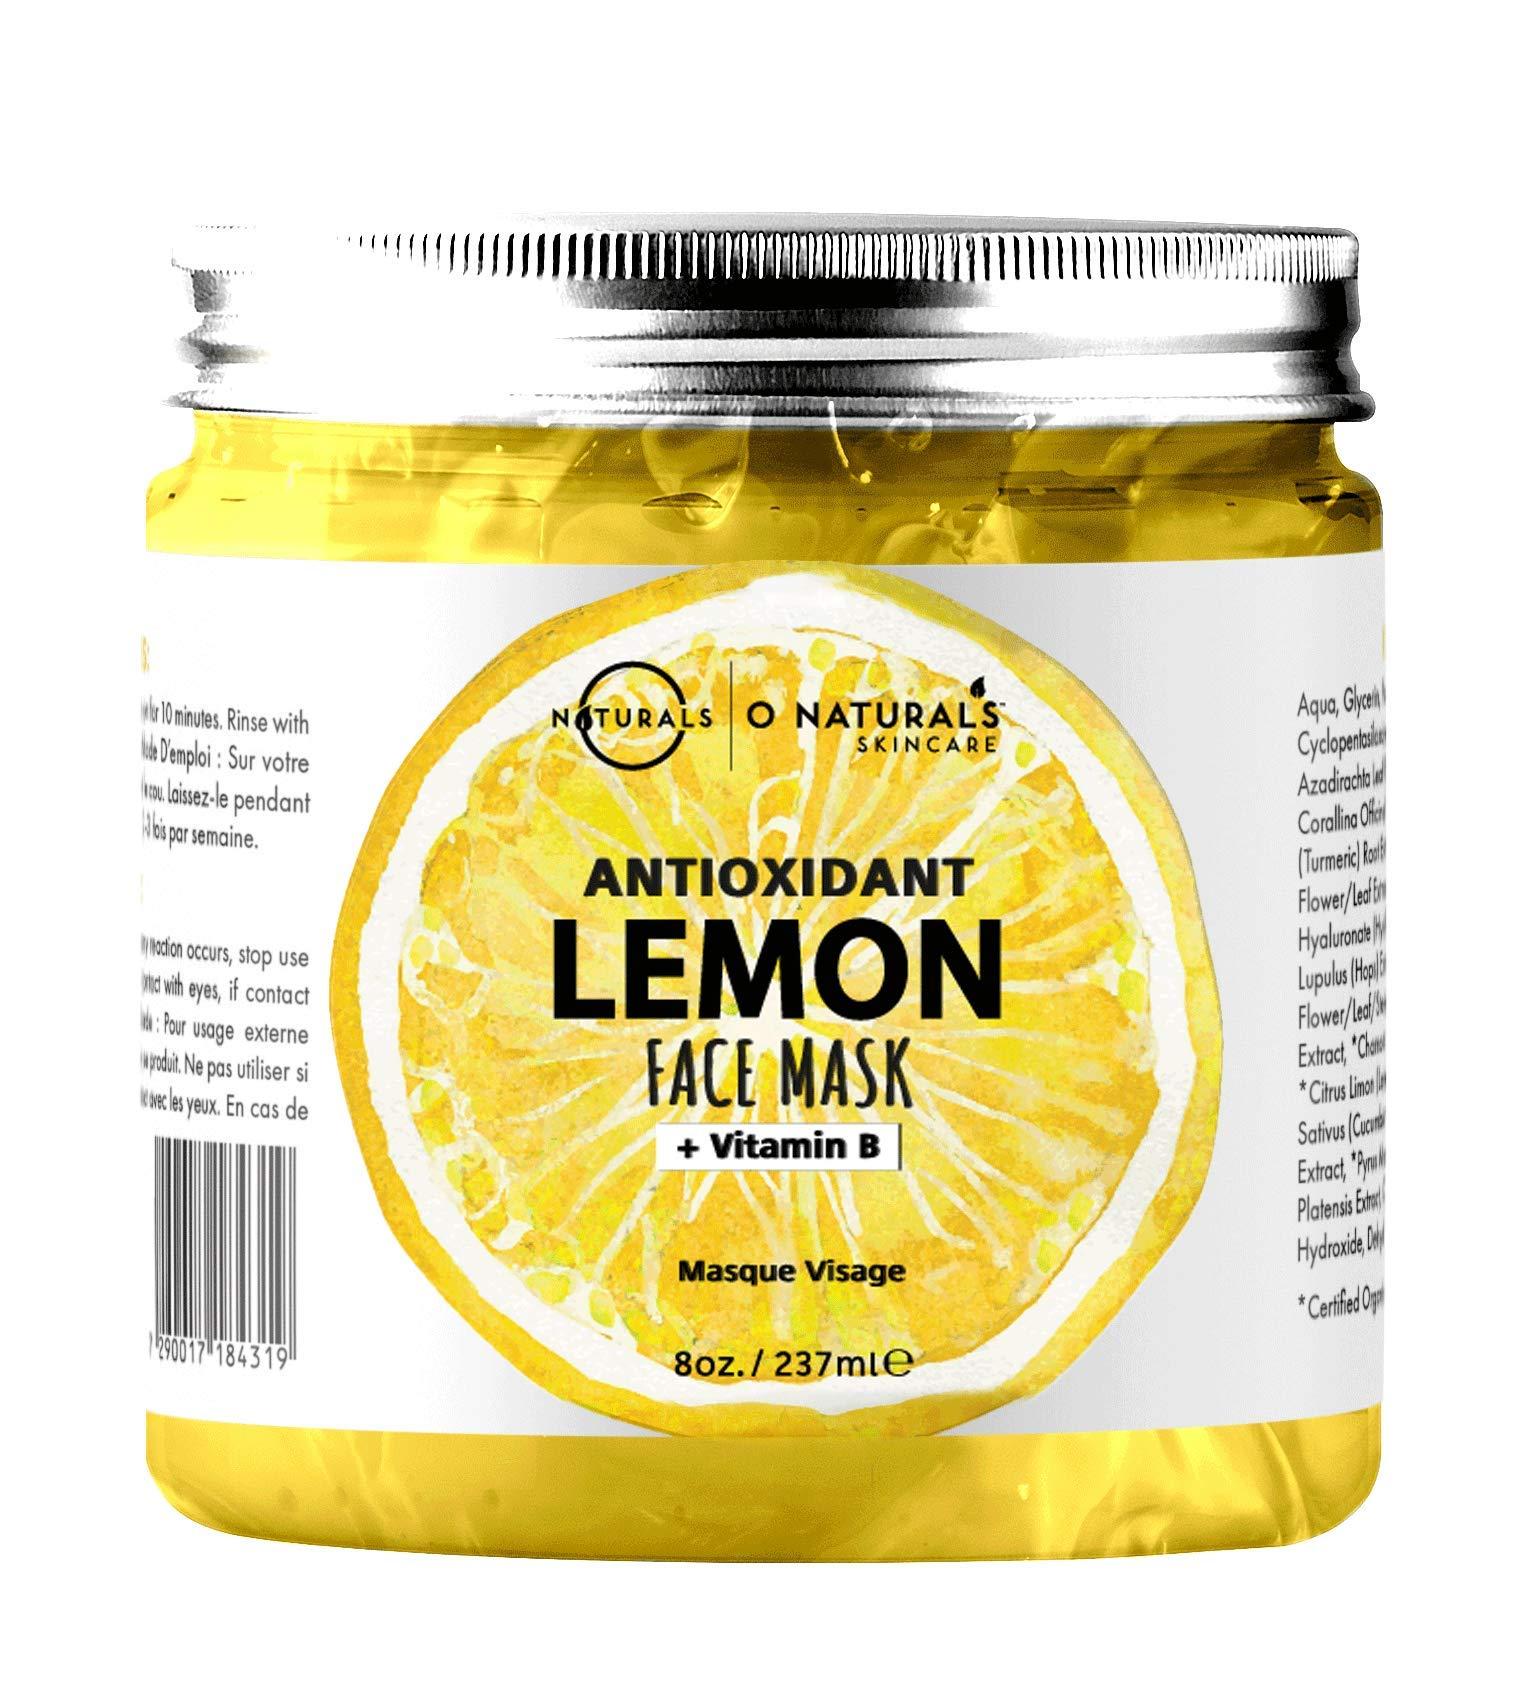 O Naturals Lemon Face Radiant Gel Mask Vitamin B Vegan Hydrating Acne Fighter Moisture Antioxidant Anti-Aging for All Type Skin Natural Organic Ingredients Hyaluronic Acid for Men-Women 8oz